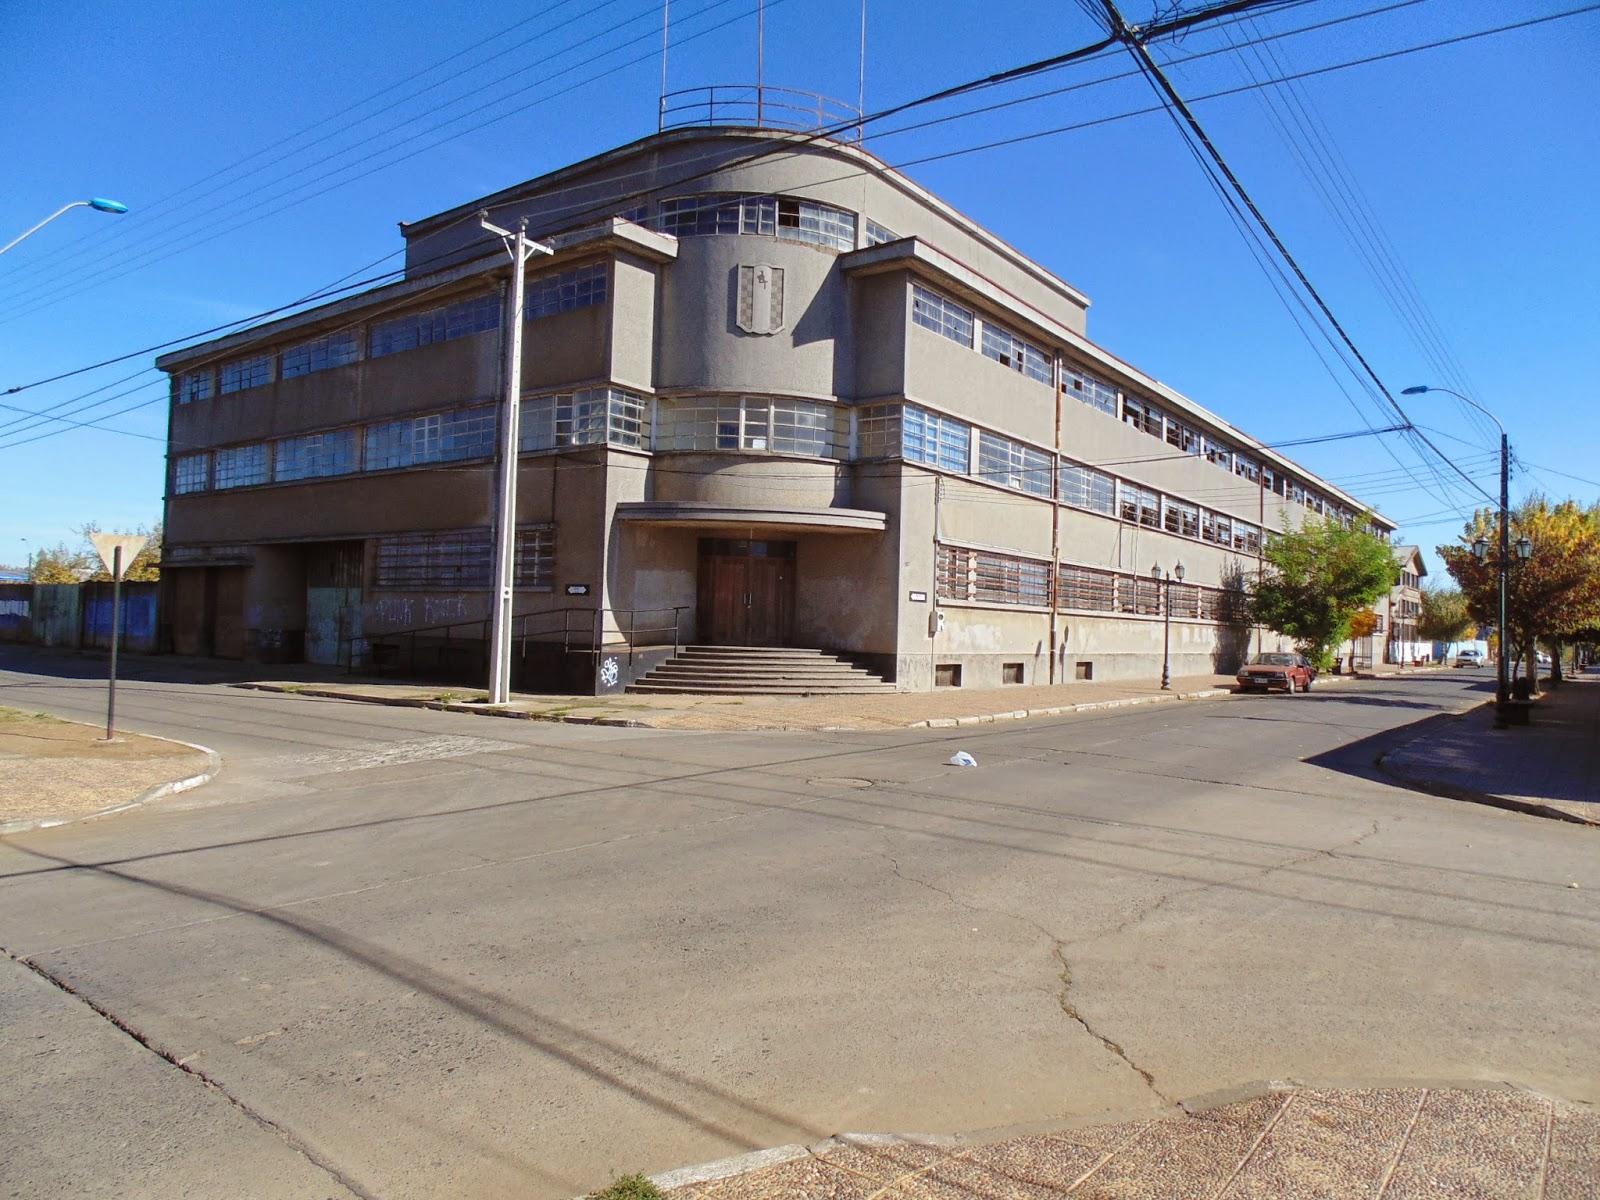 Fotograsolomio 2015 # Fabrica De Muebles Saavedra